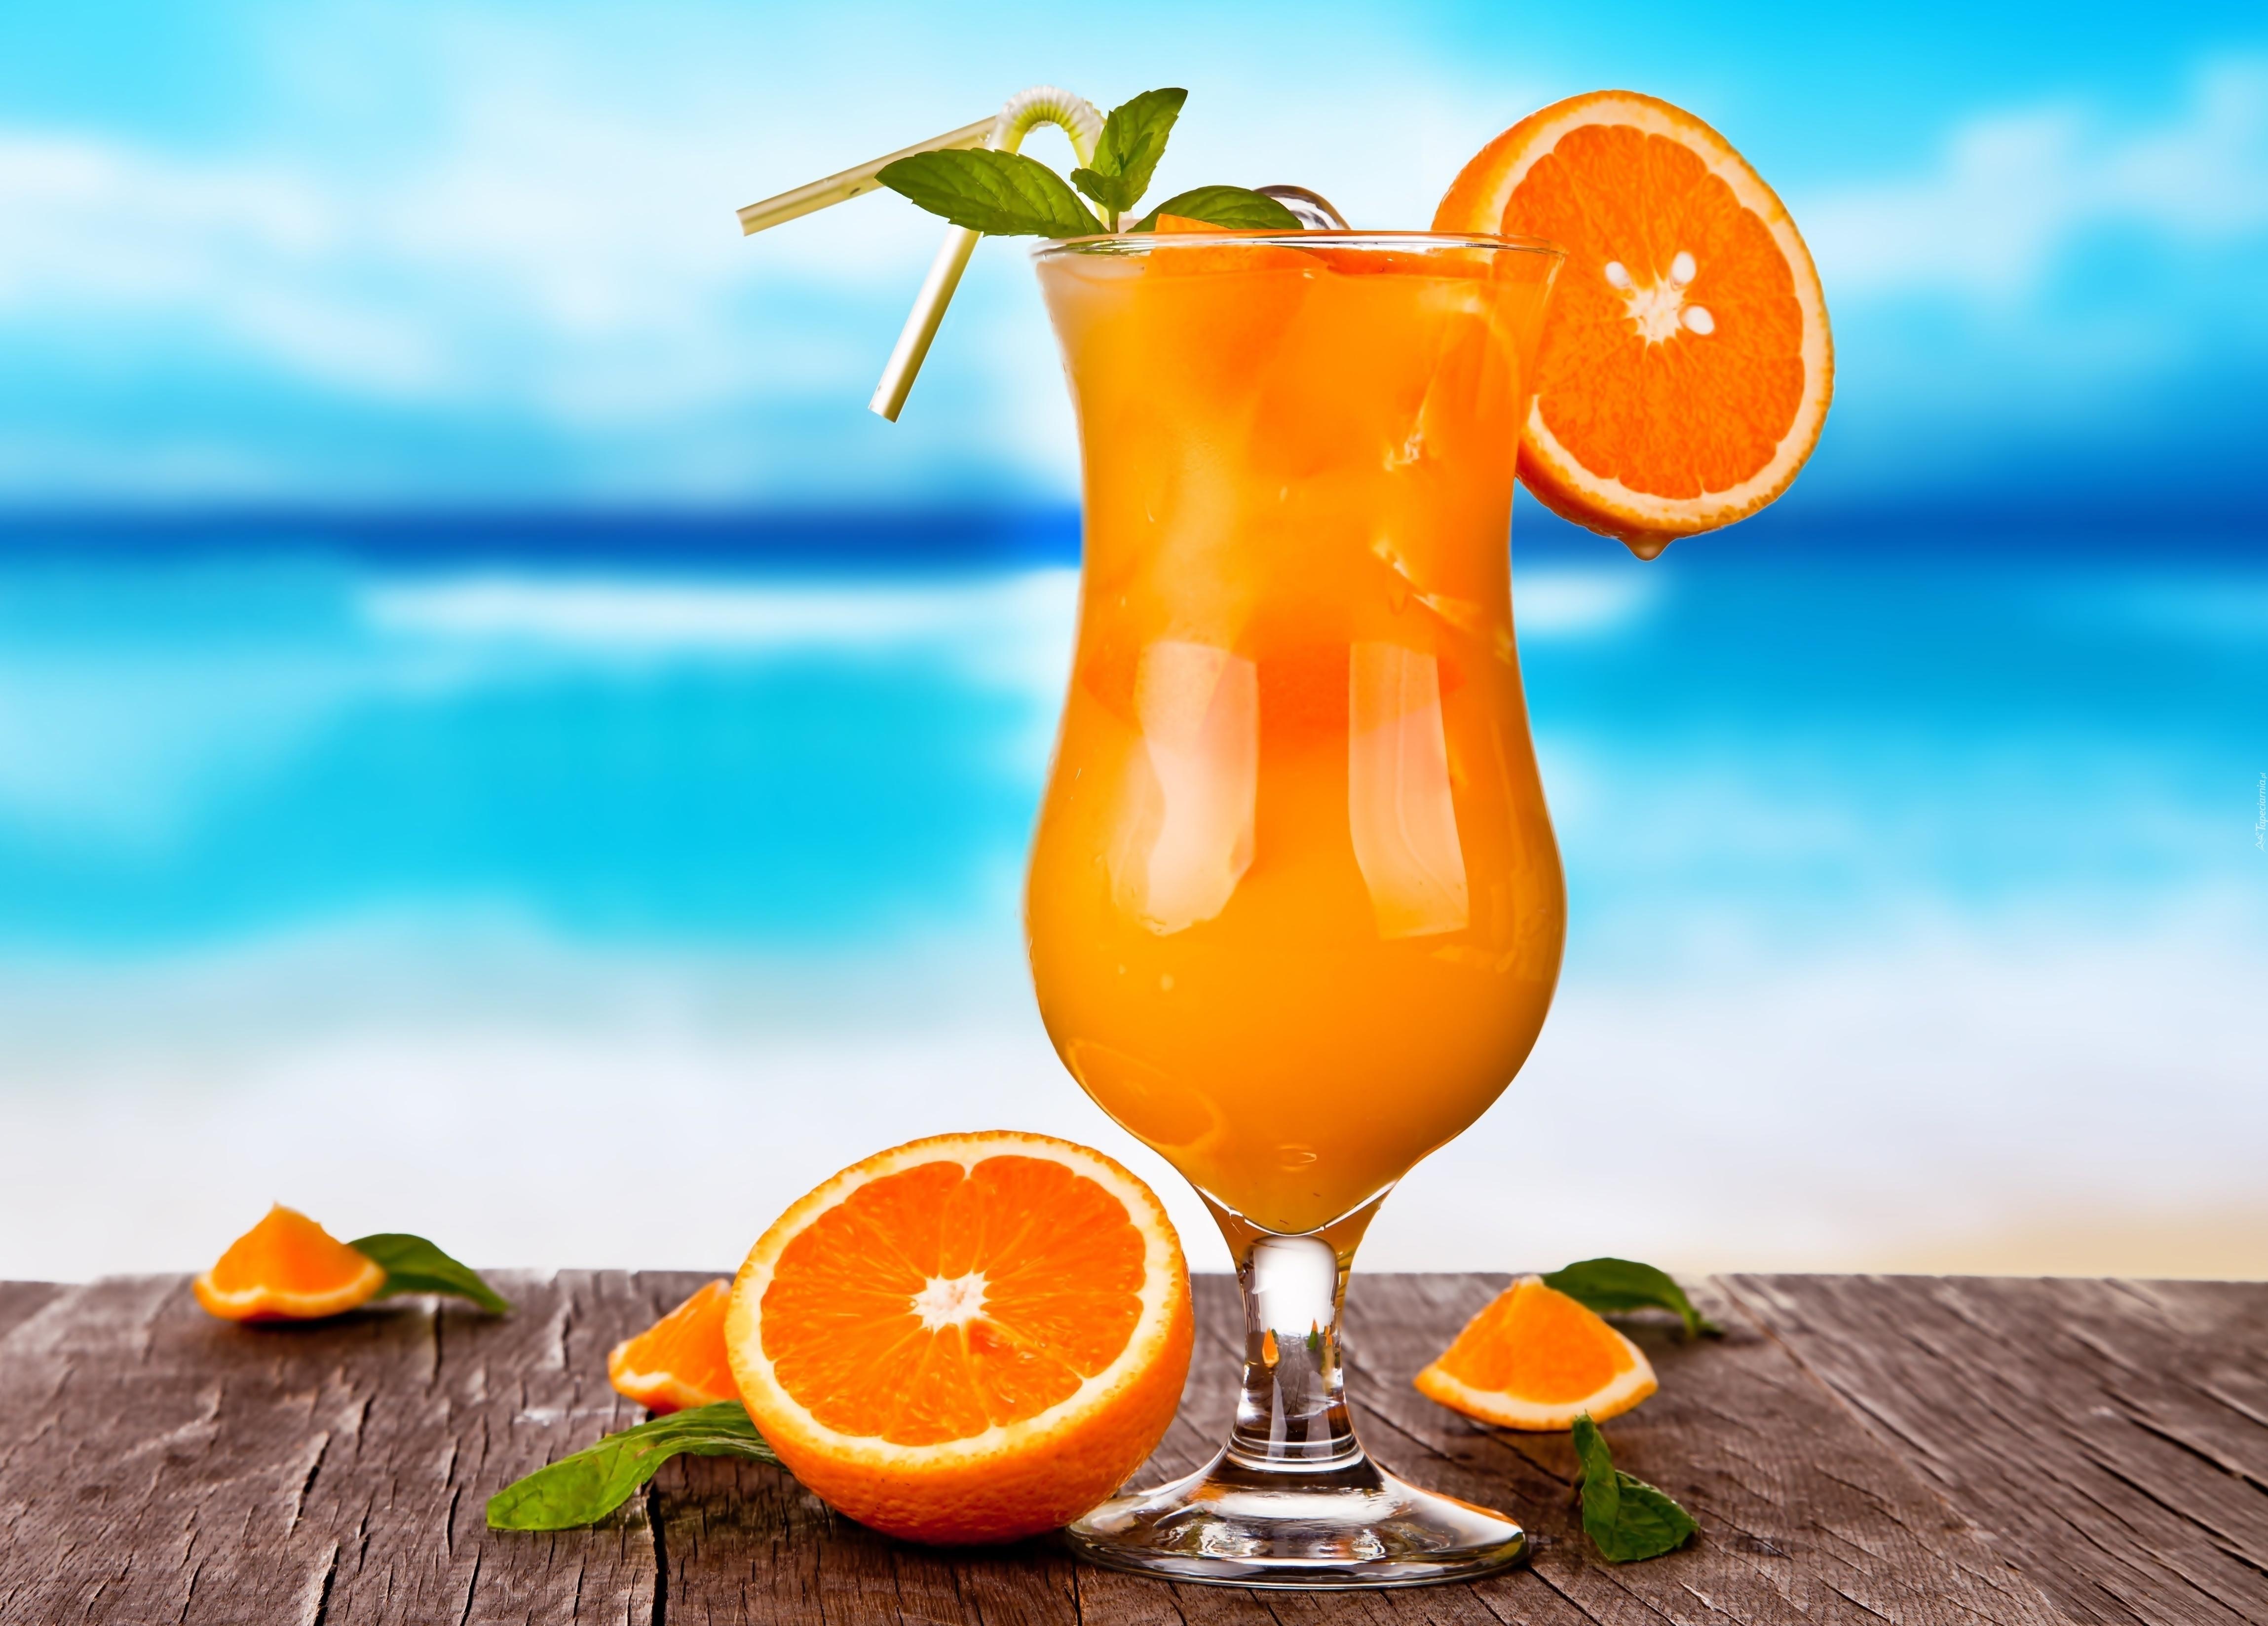 еда апельсин сок food orange juice бесплатно